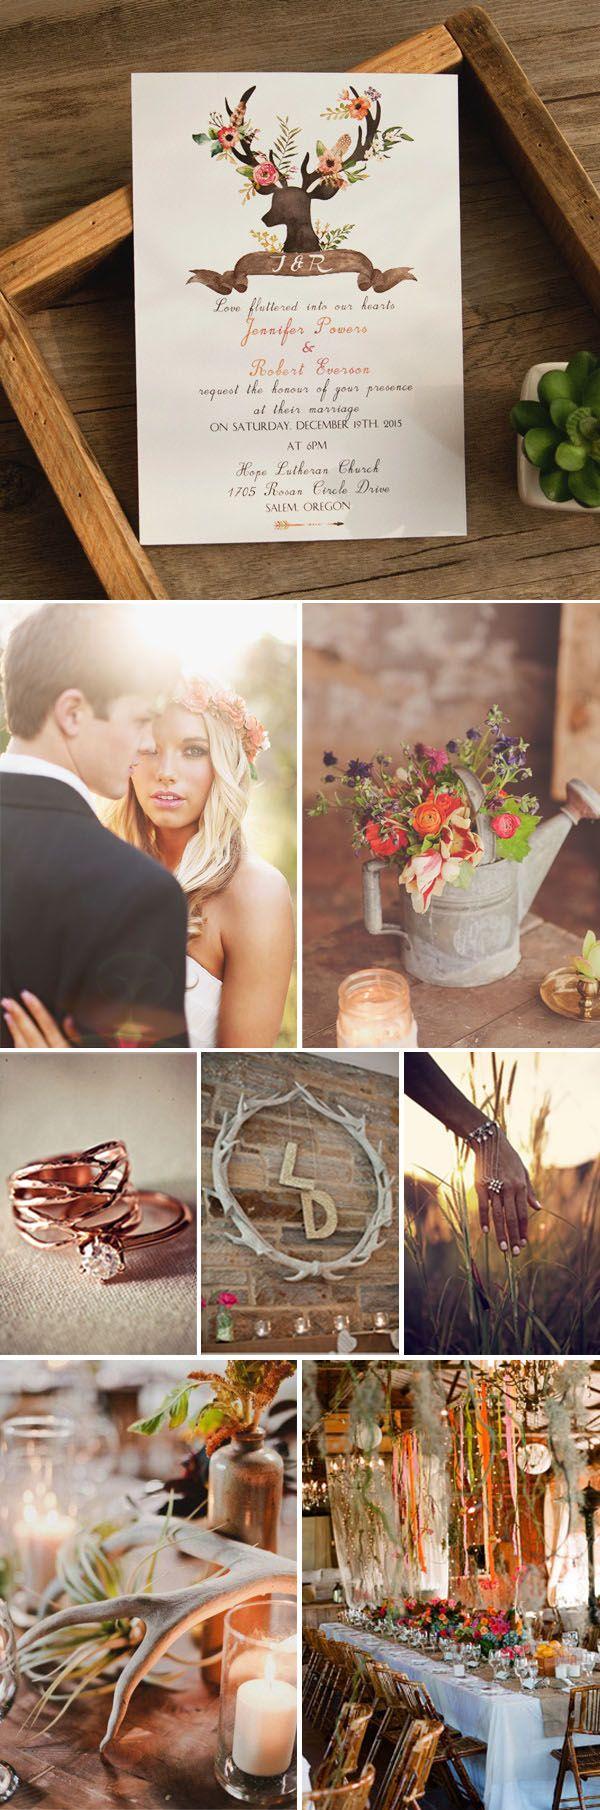 Seven Popular Rustic Wedding Invitation Styles For 2016 Spring & Summer  Weddings